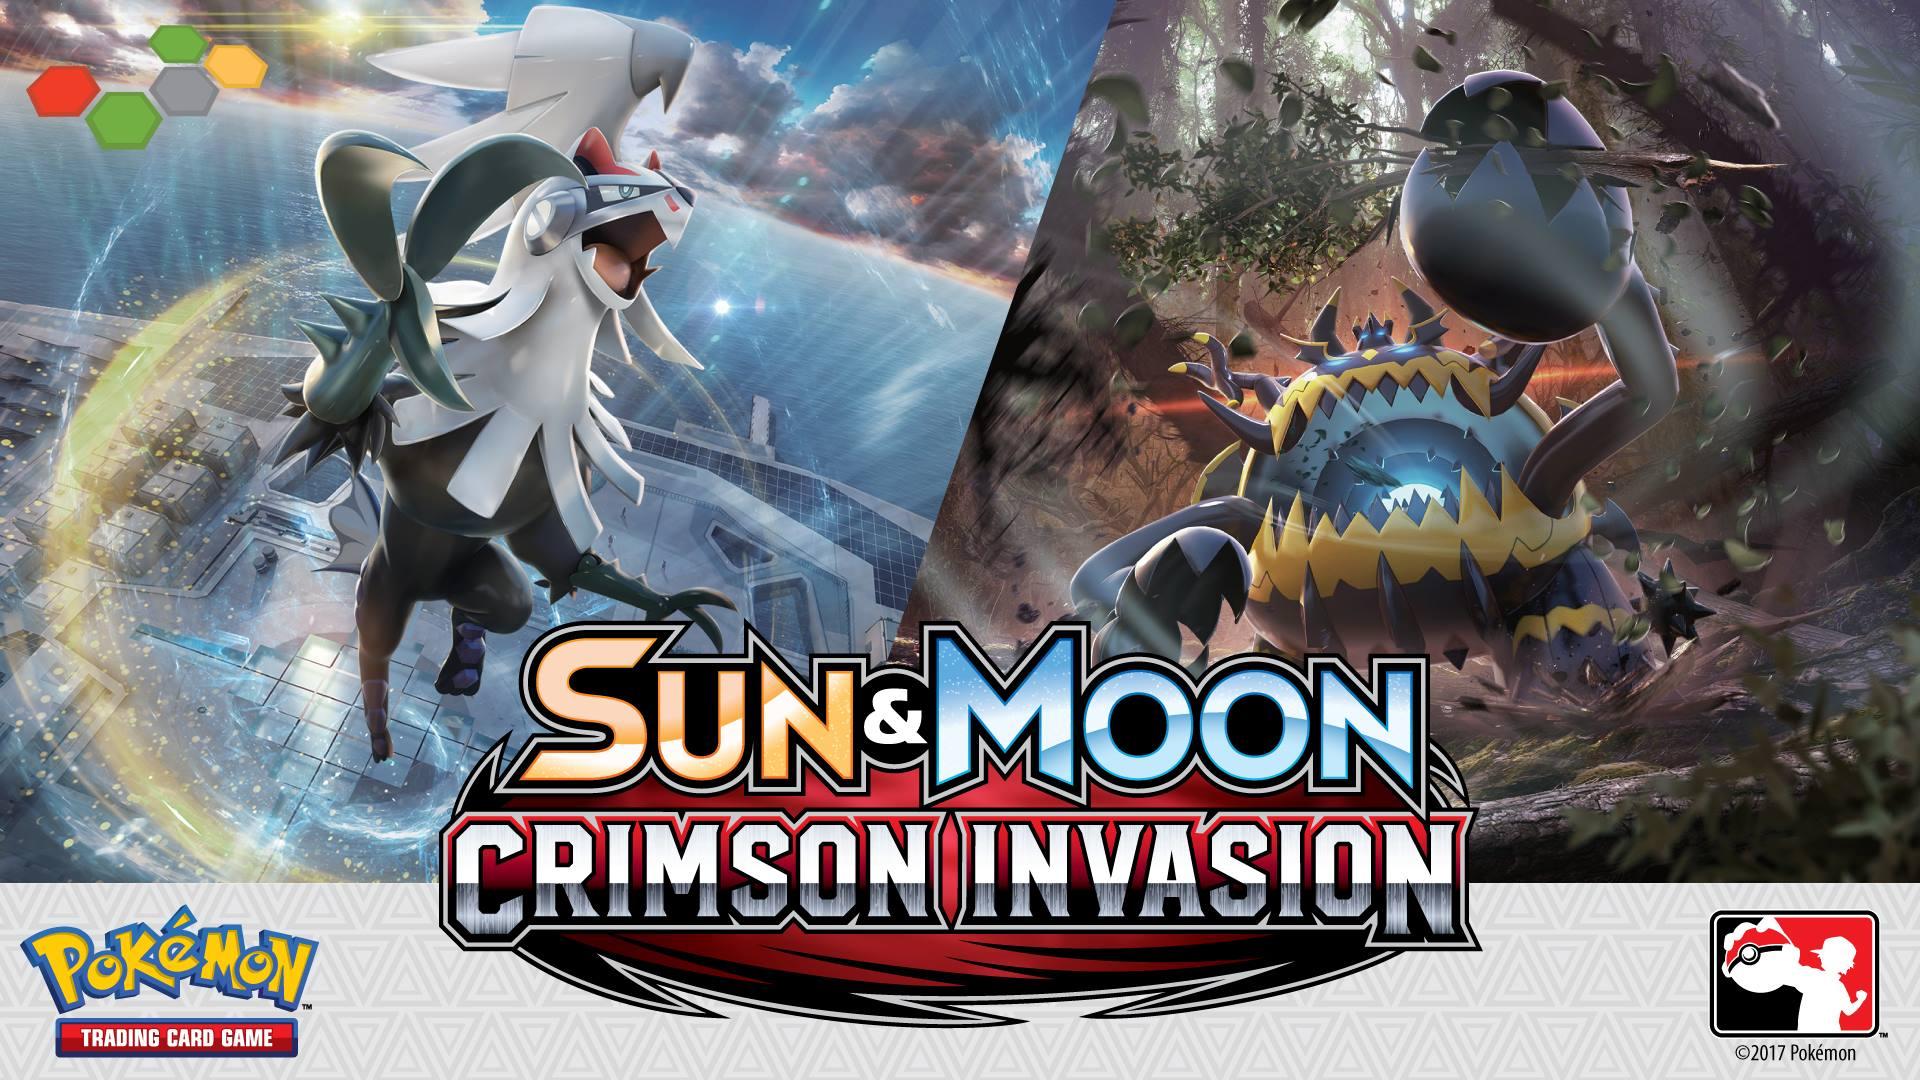 pokemon crimson invasion event image.jpg